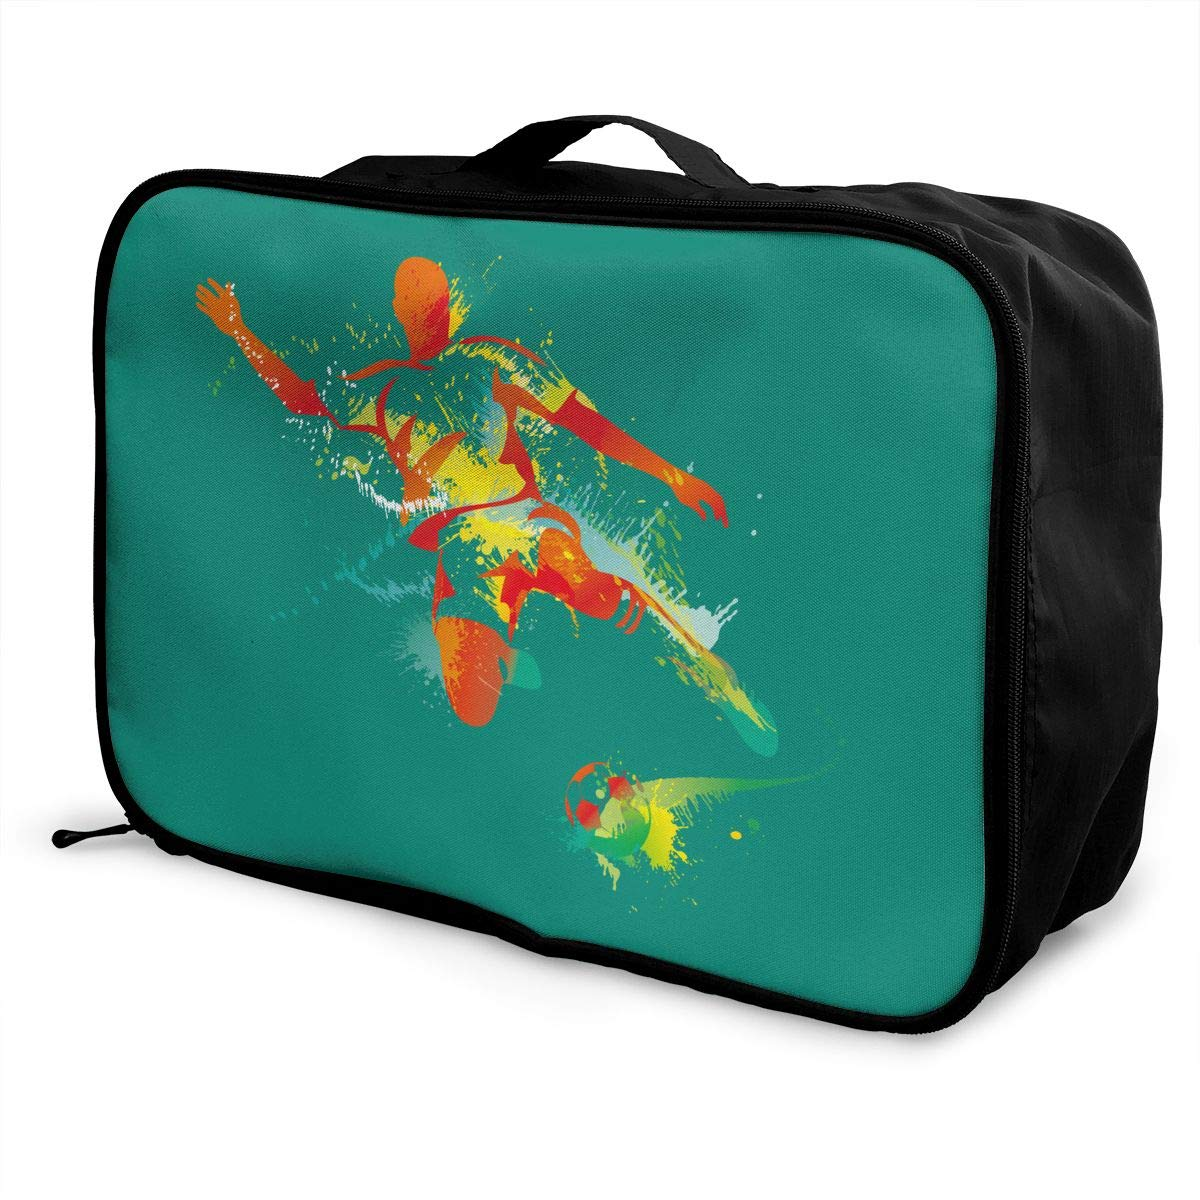 Travel Luggage Duffle Bag Lightweight Portable Handbag Soccer Large Capacity Waterproof Foldable Storage Tote